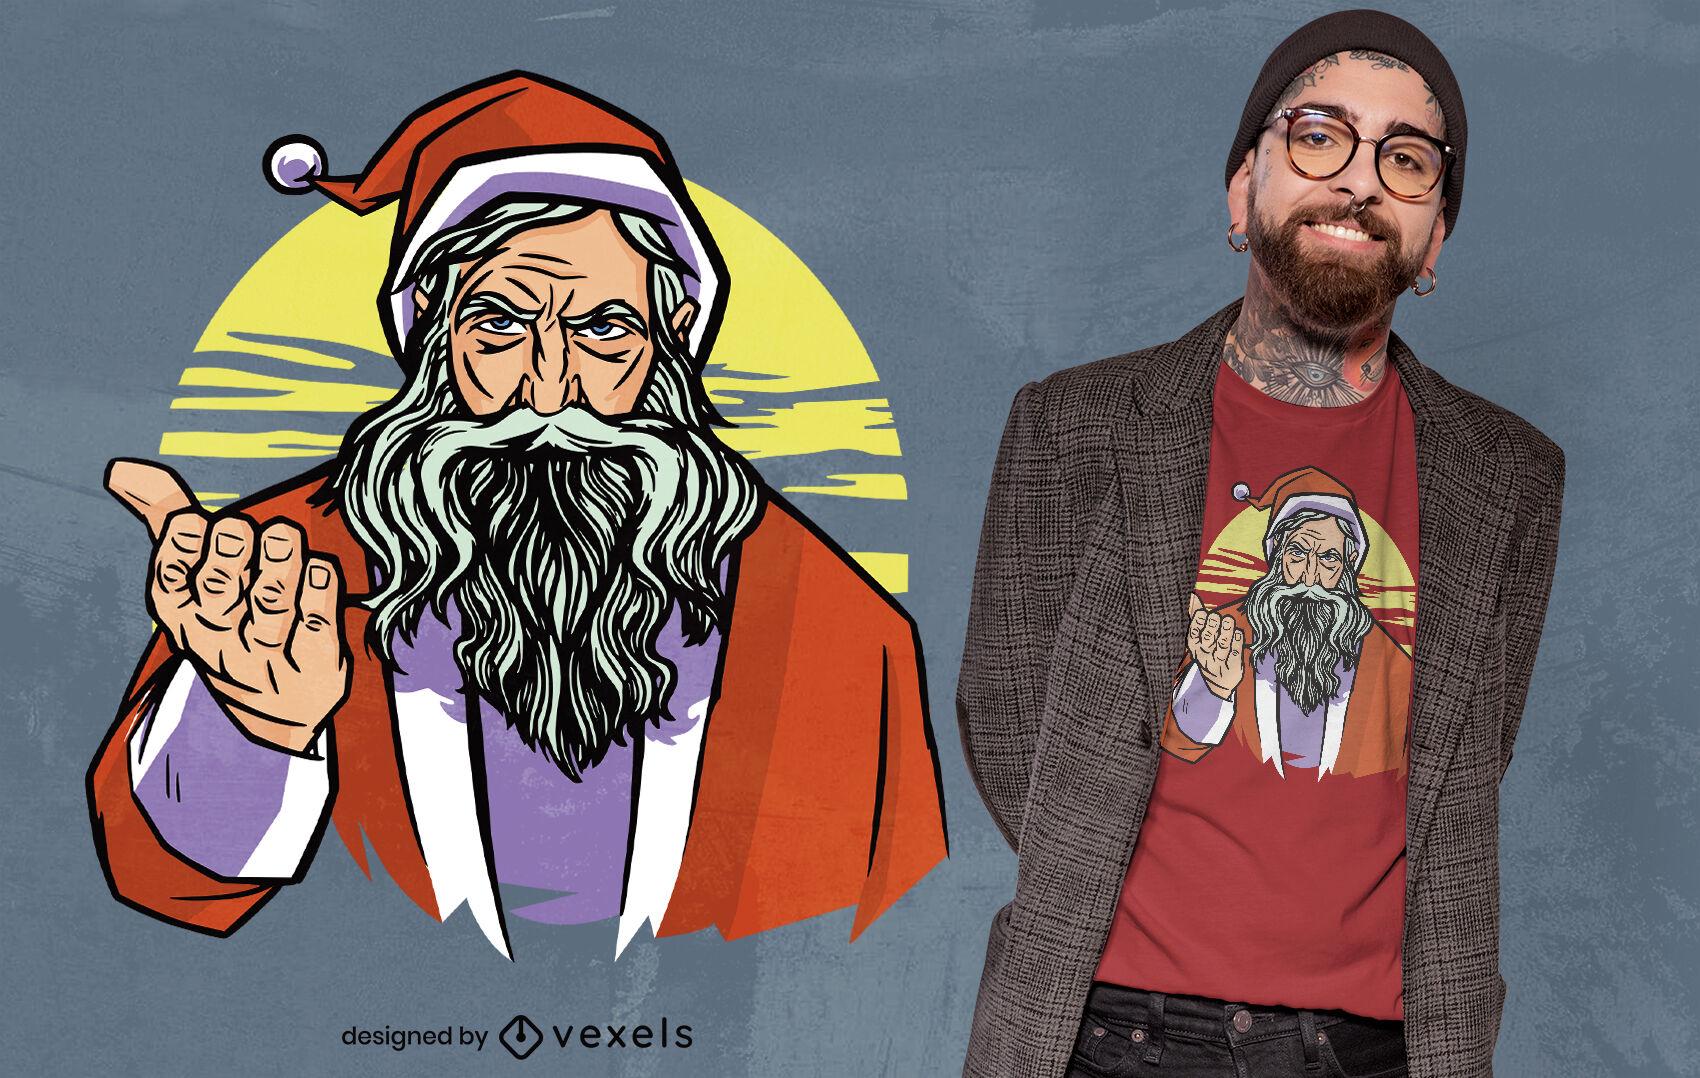 Dise?o de camiseta de ilustraci?n de Santa Claus serio